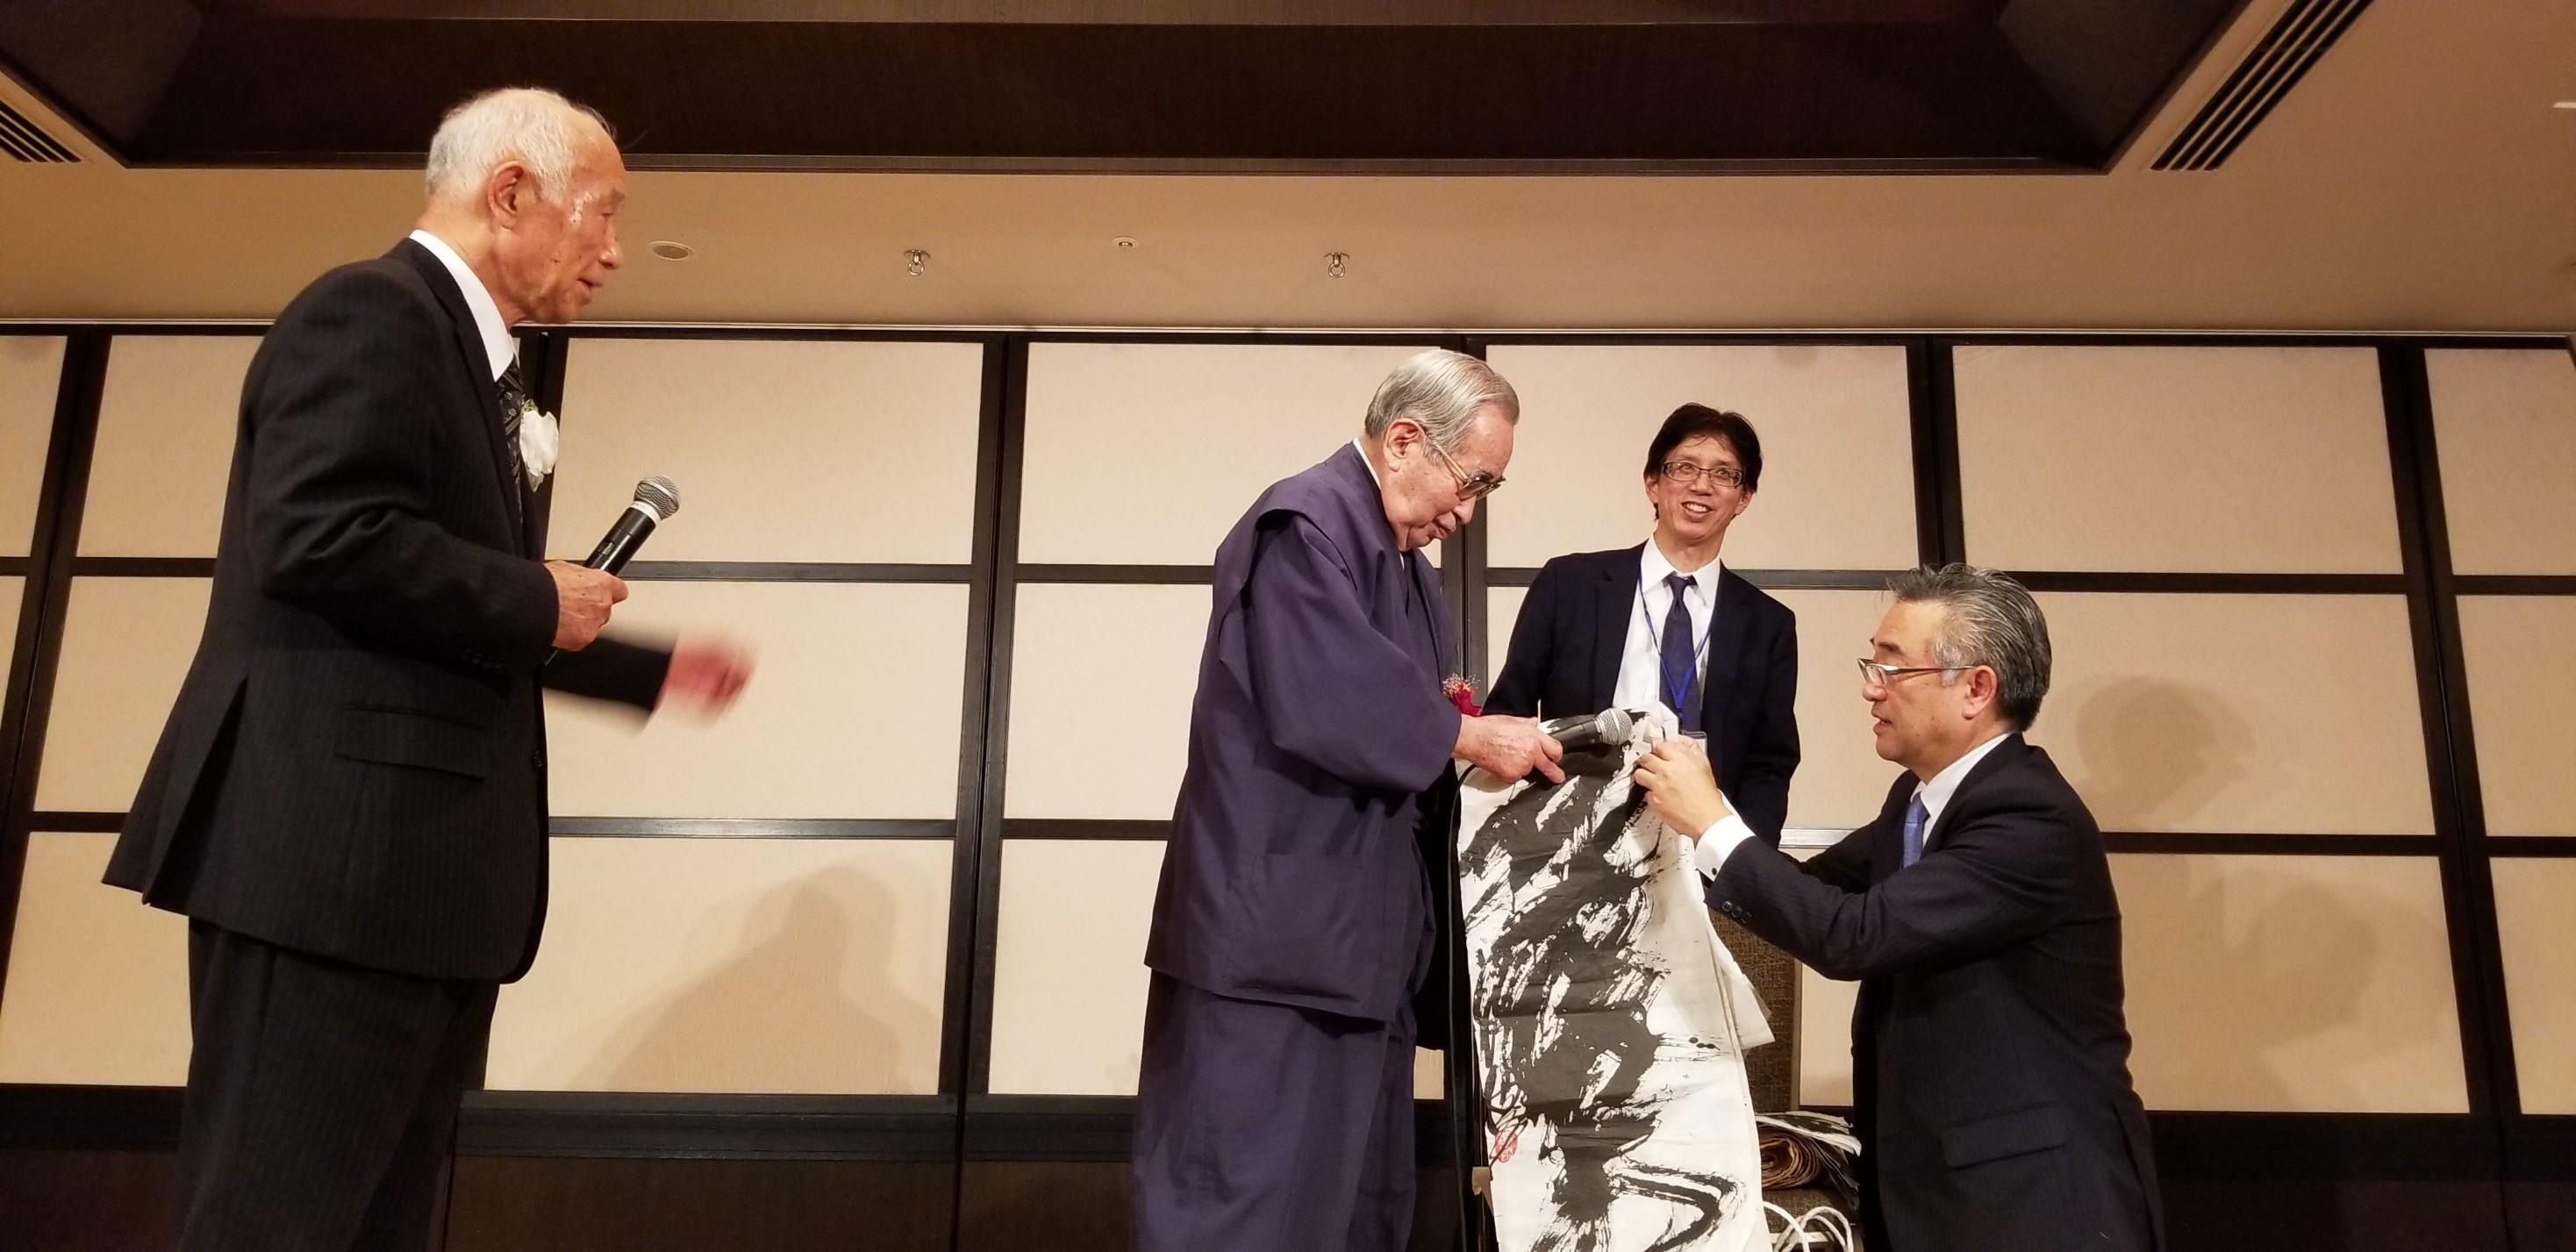 03a2145dee56cf7d8271189f2c452614 - 第6回思風会全国大会2018in東京開催